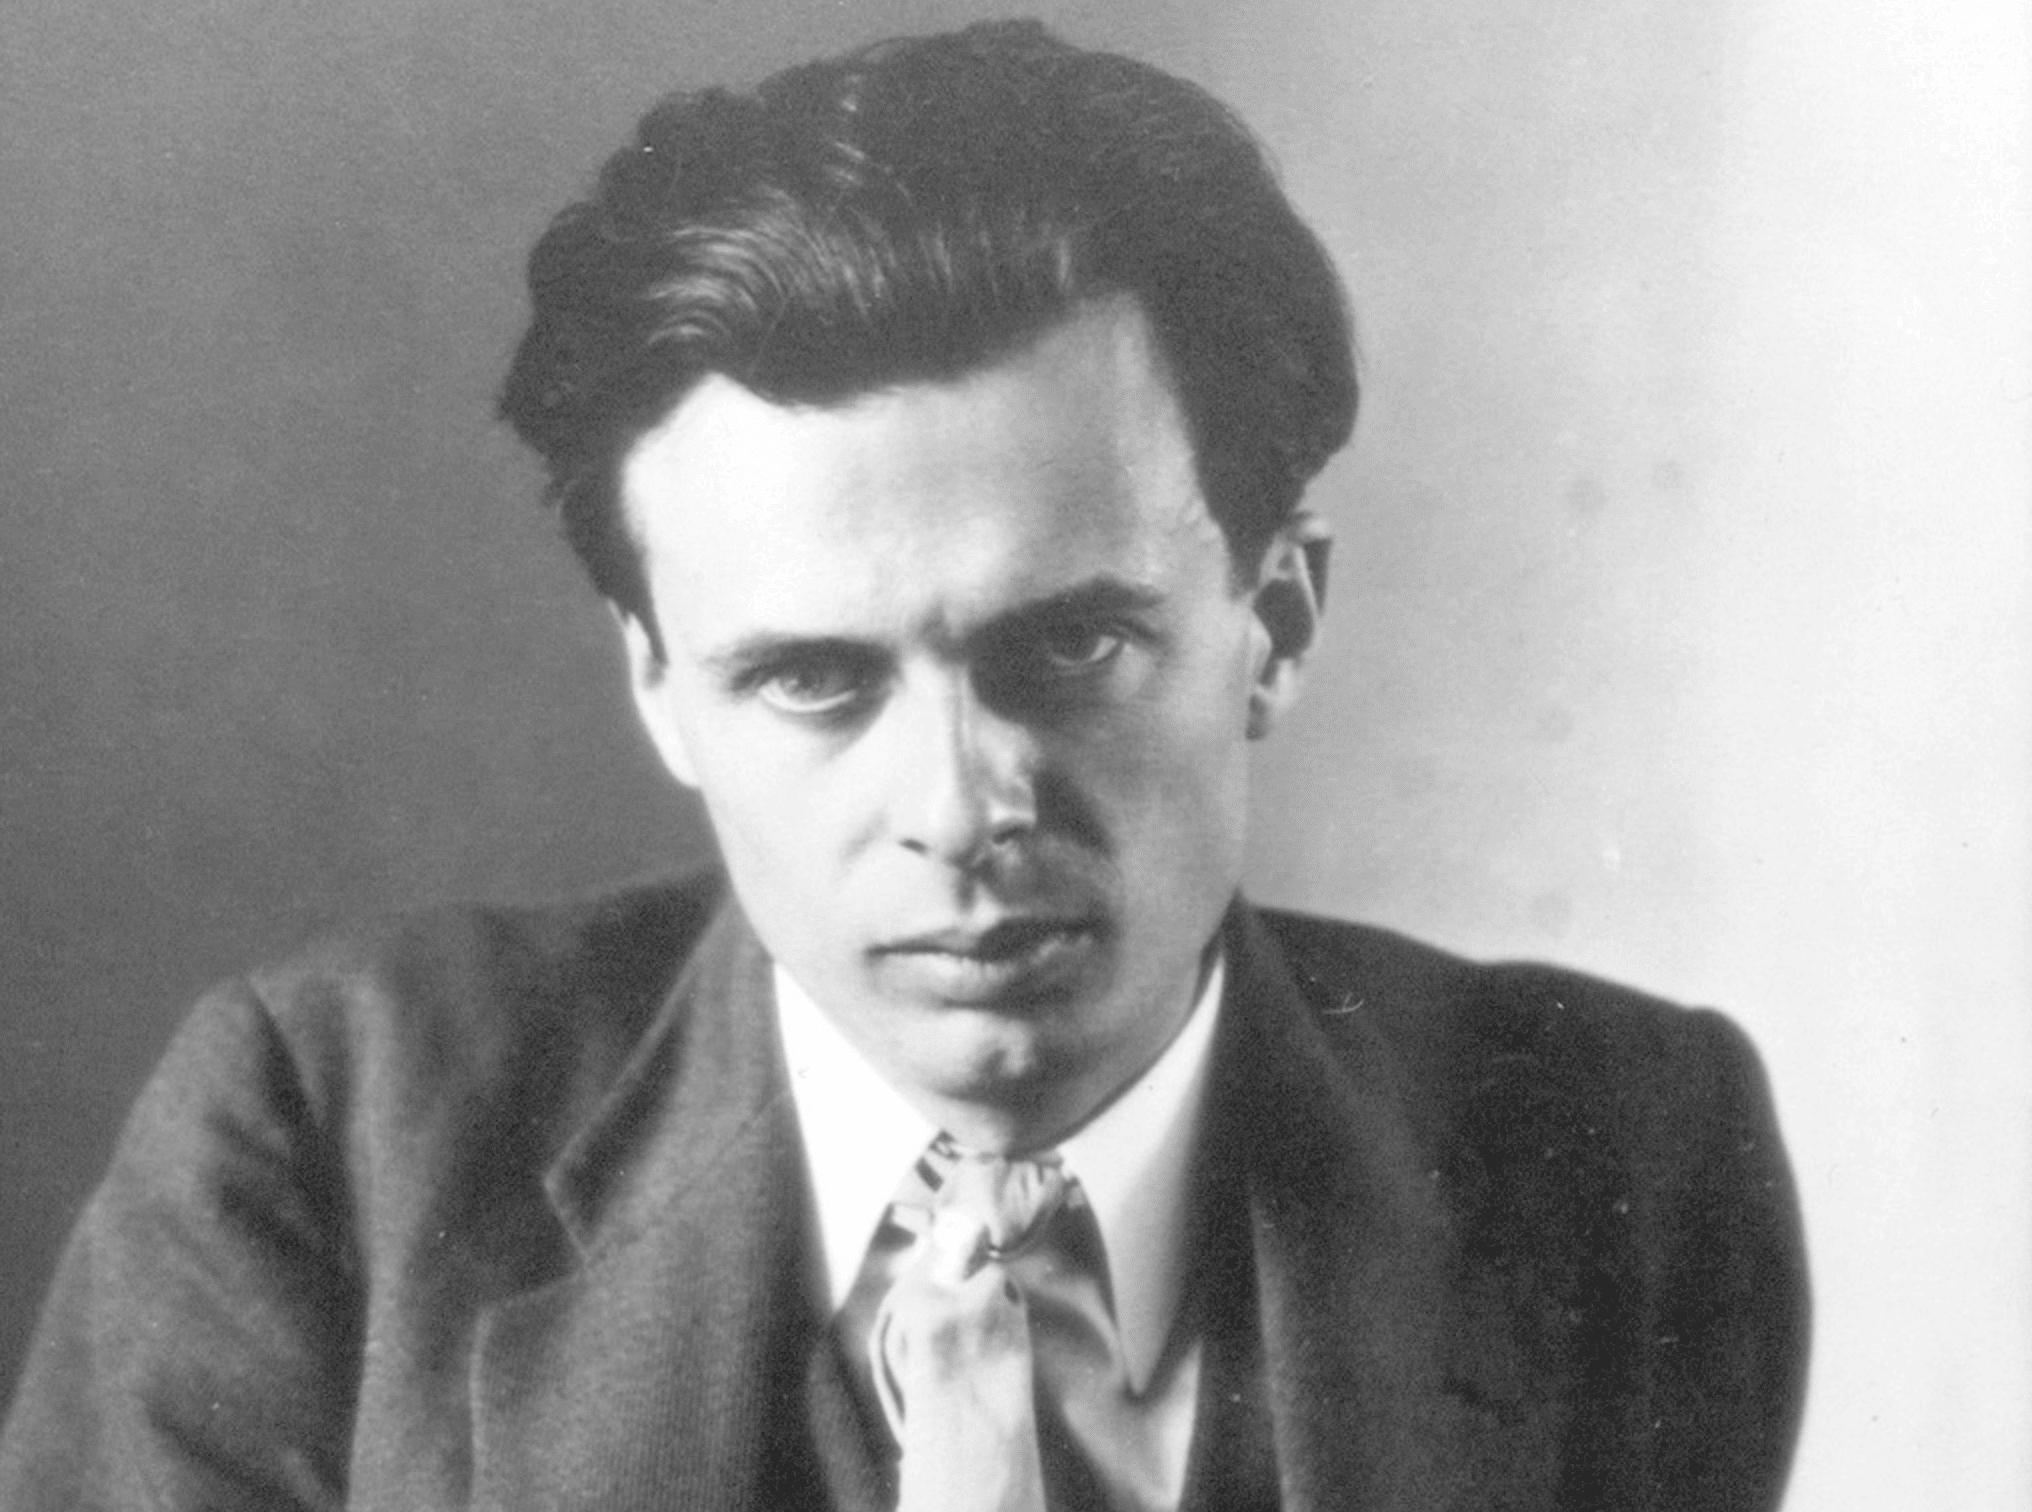 Aldous Huxley on Technodictators